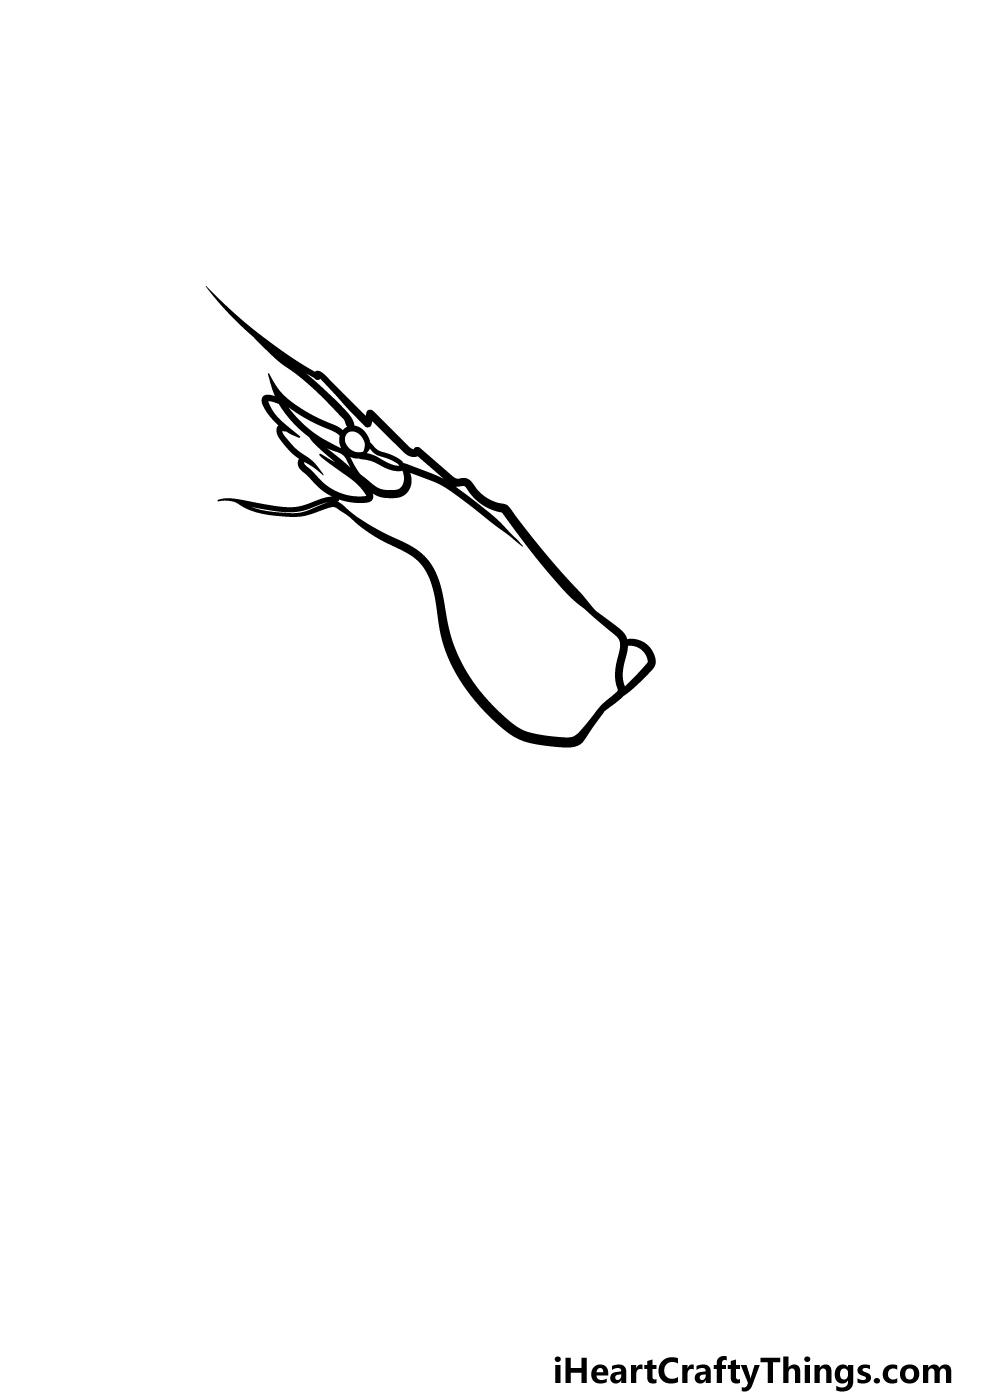 drawing a shrimp step 1